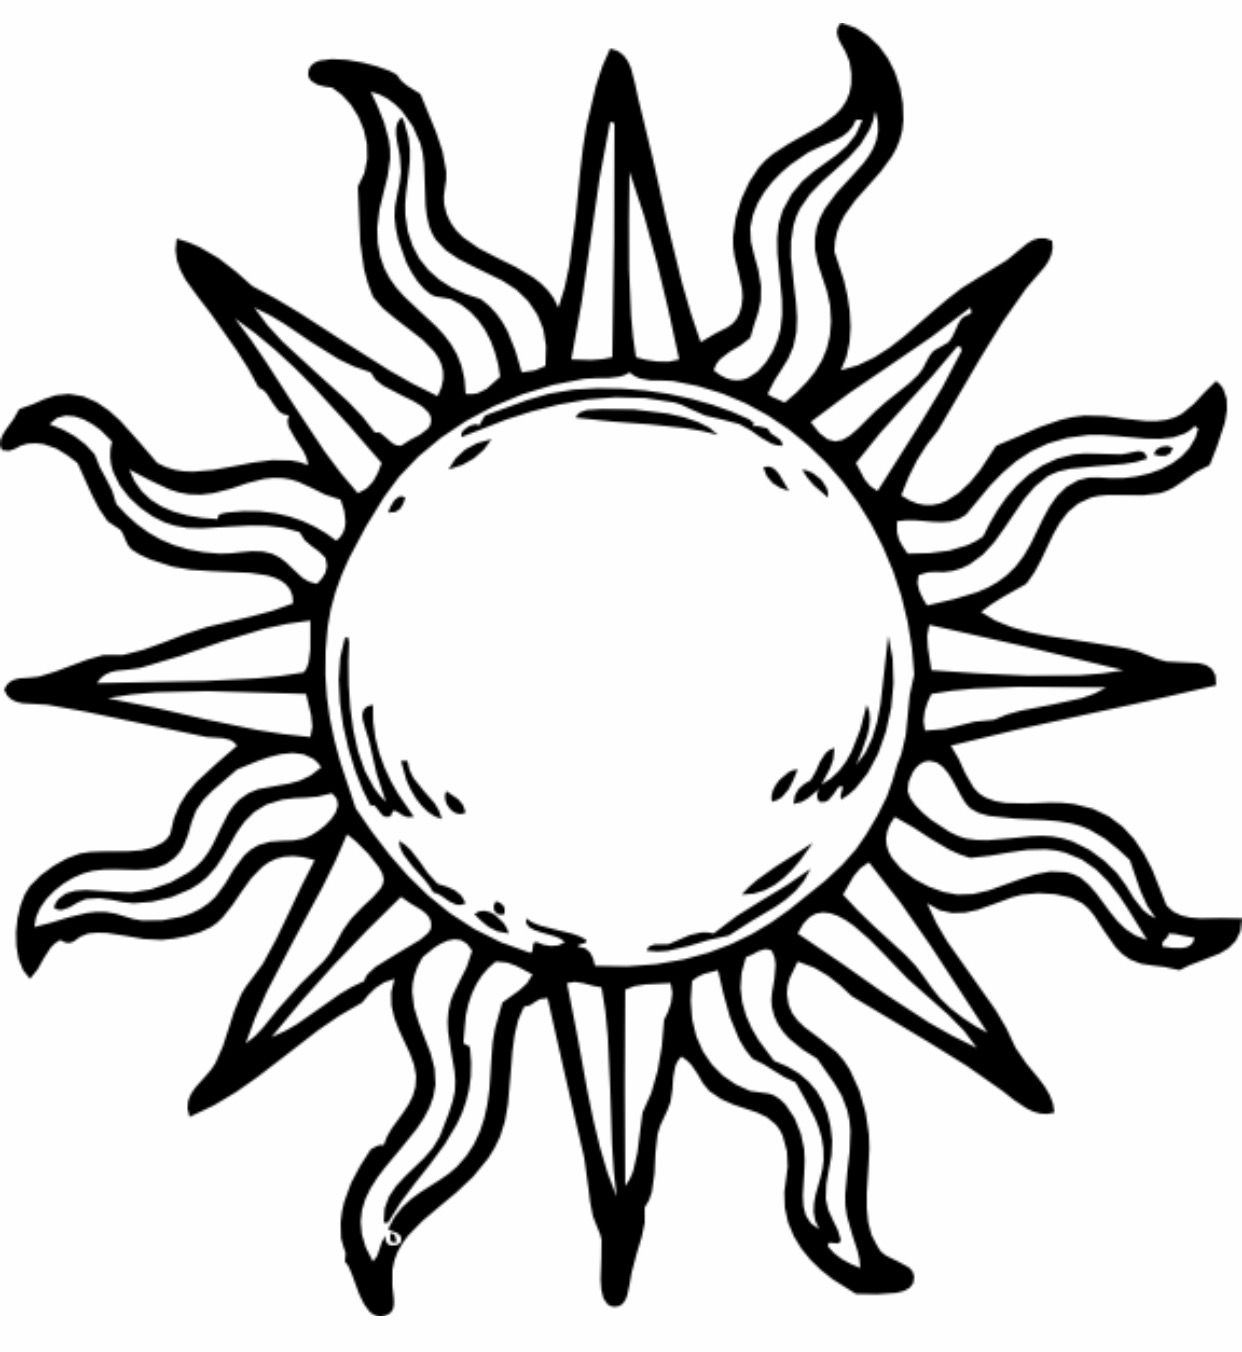 Sun tattoo Sun tattoo designs, Sun tattoo, Sun drawing